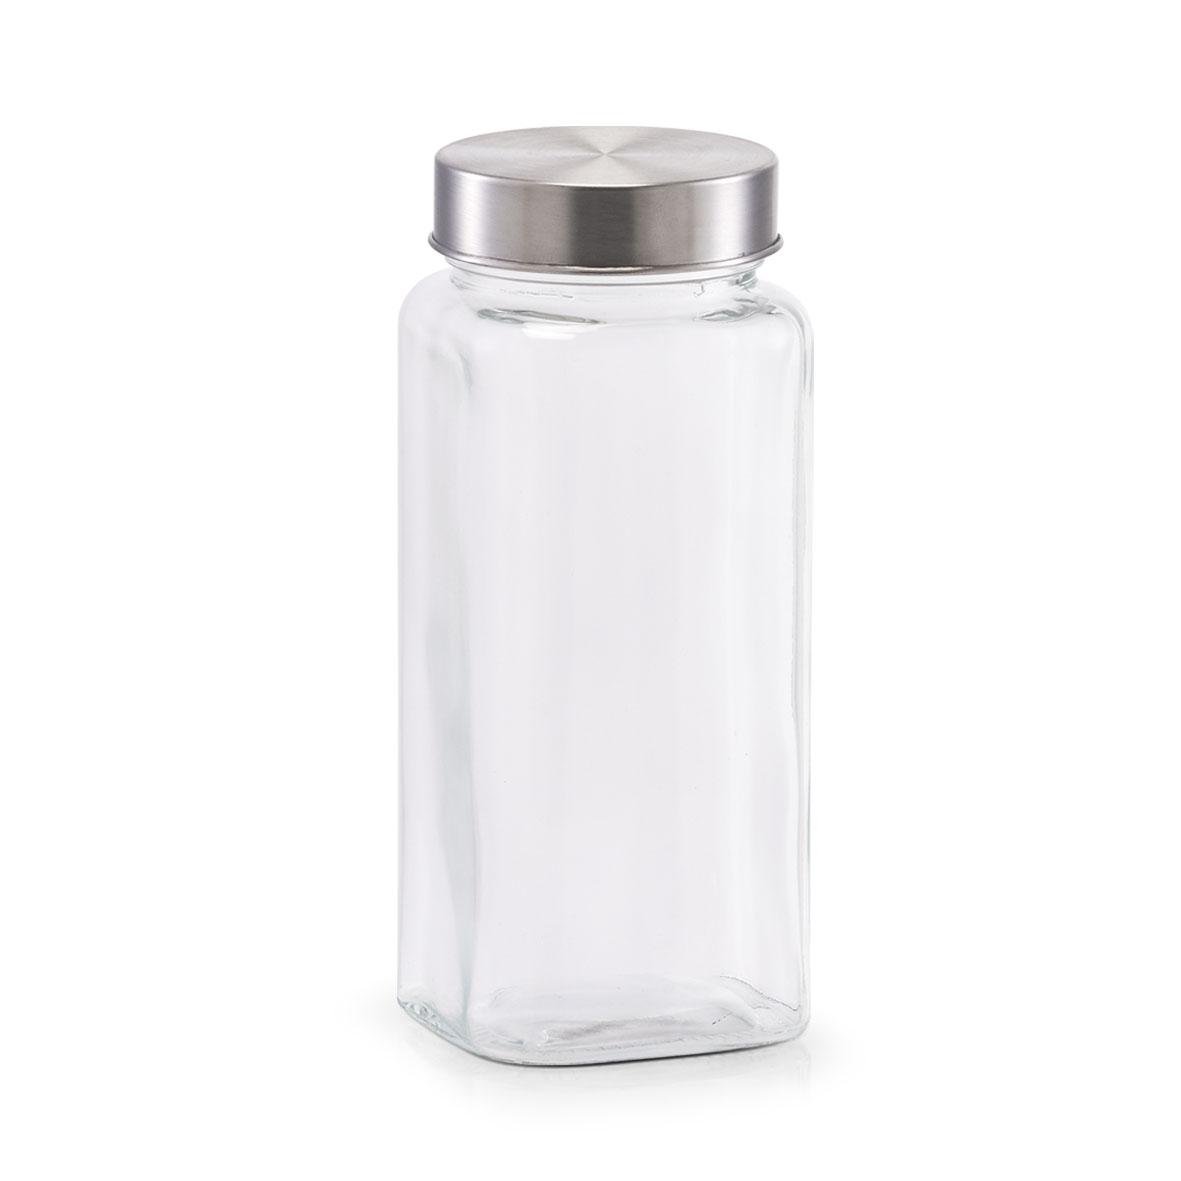 Recipient pentru depozitare din sticla Mini, capac metalic, 620 ml, Ø7,5xH17,5 cm poza